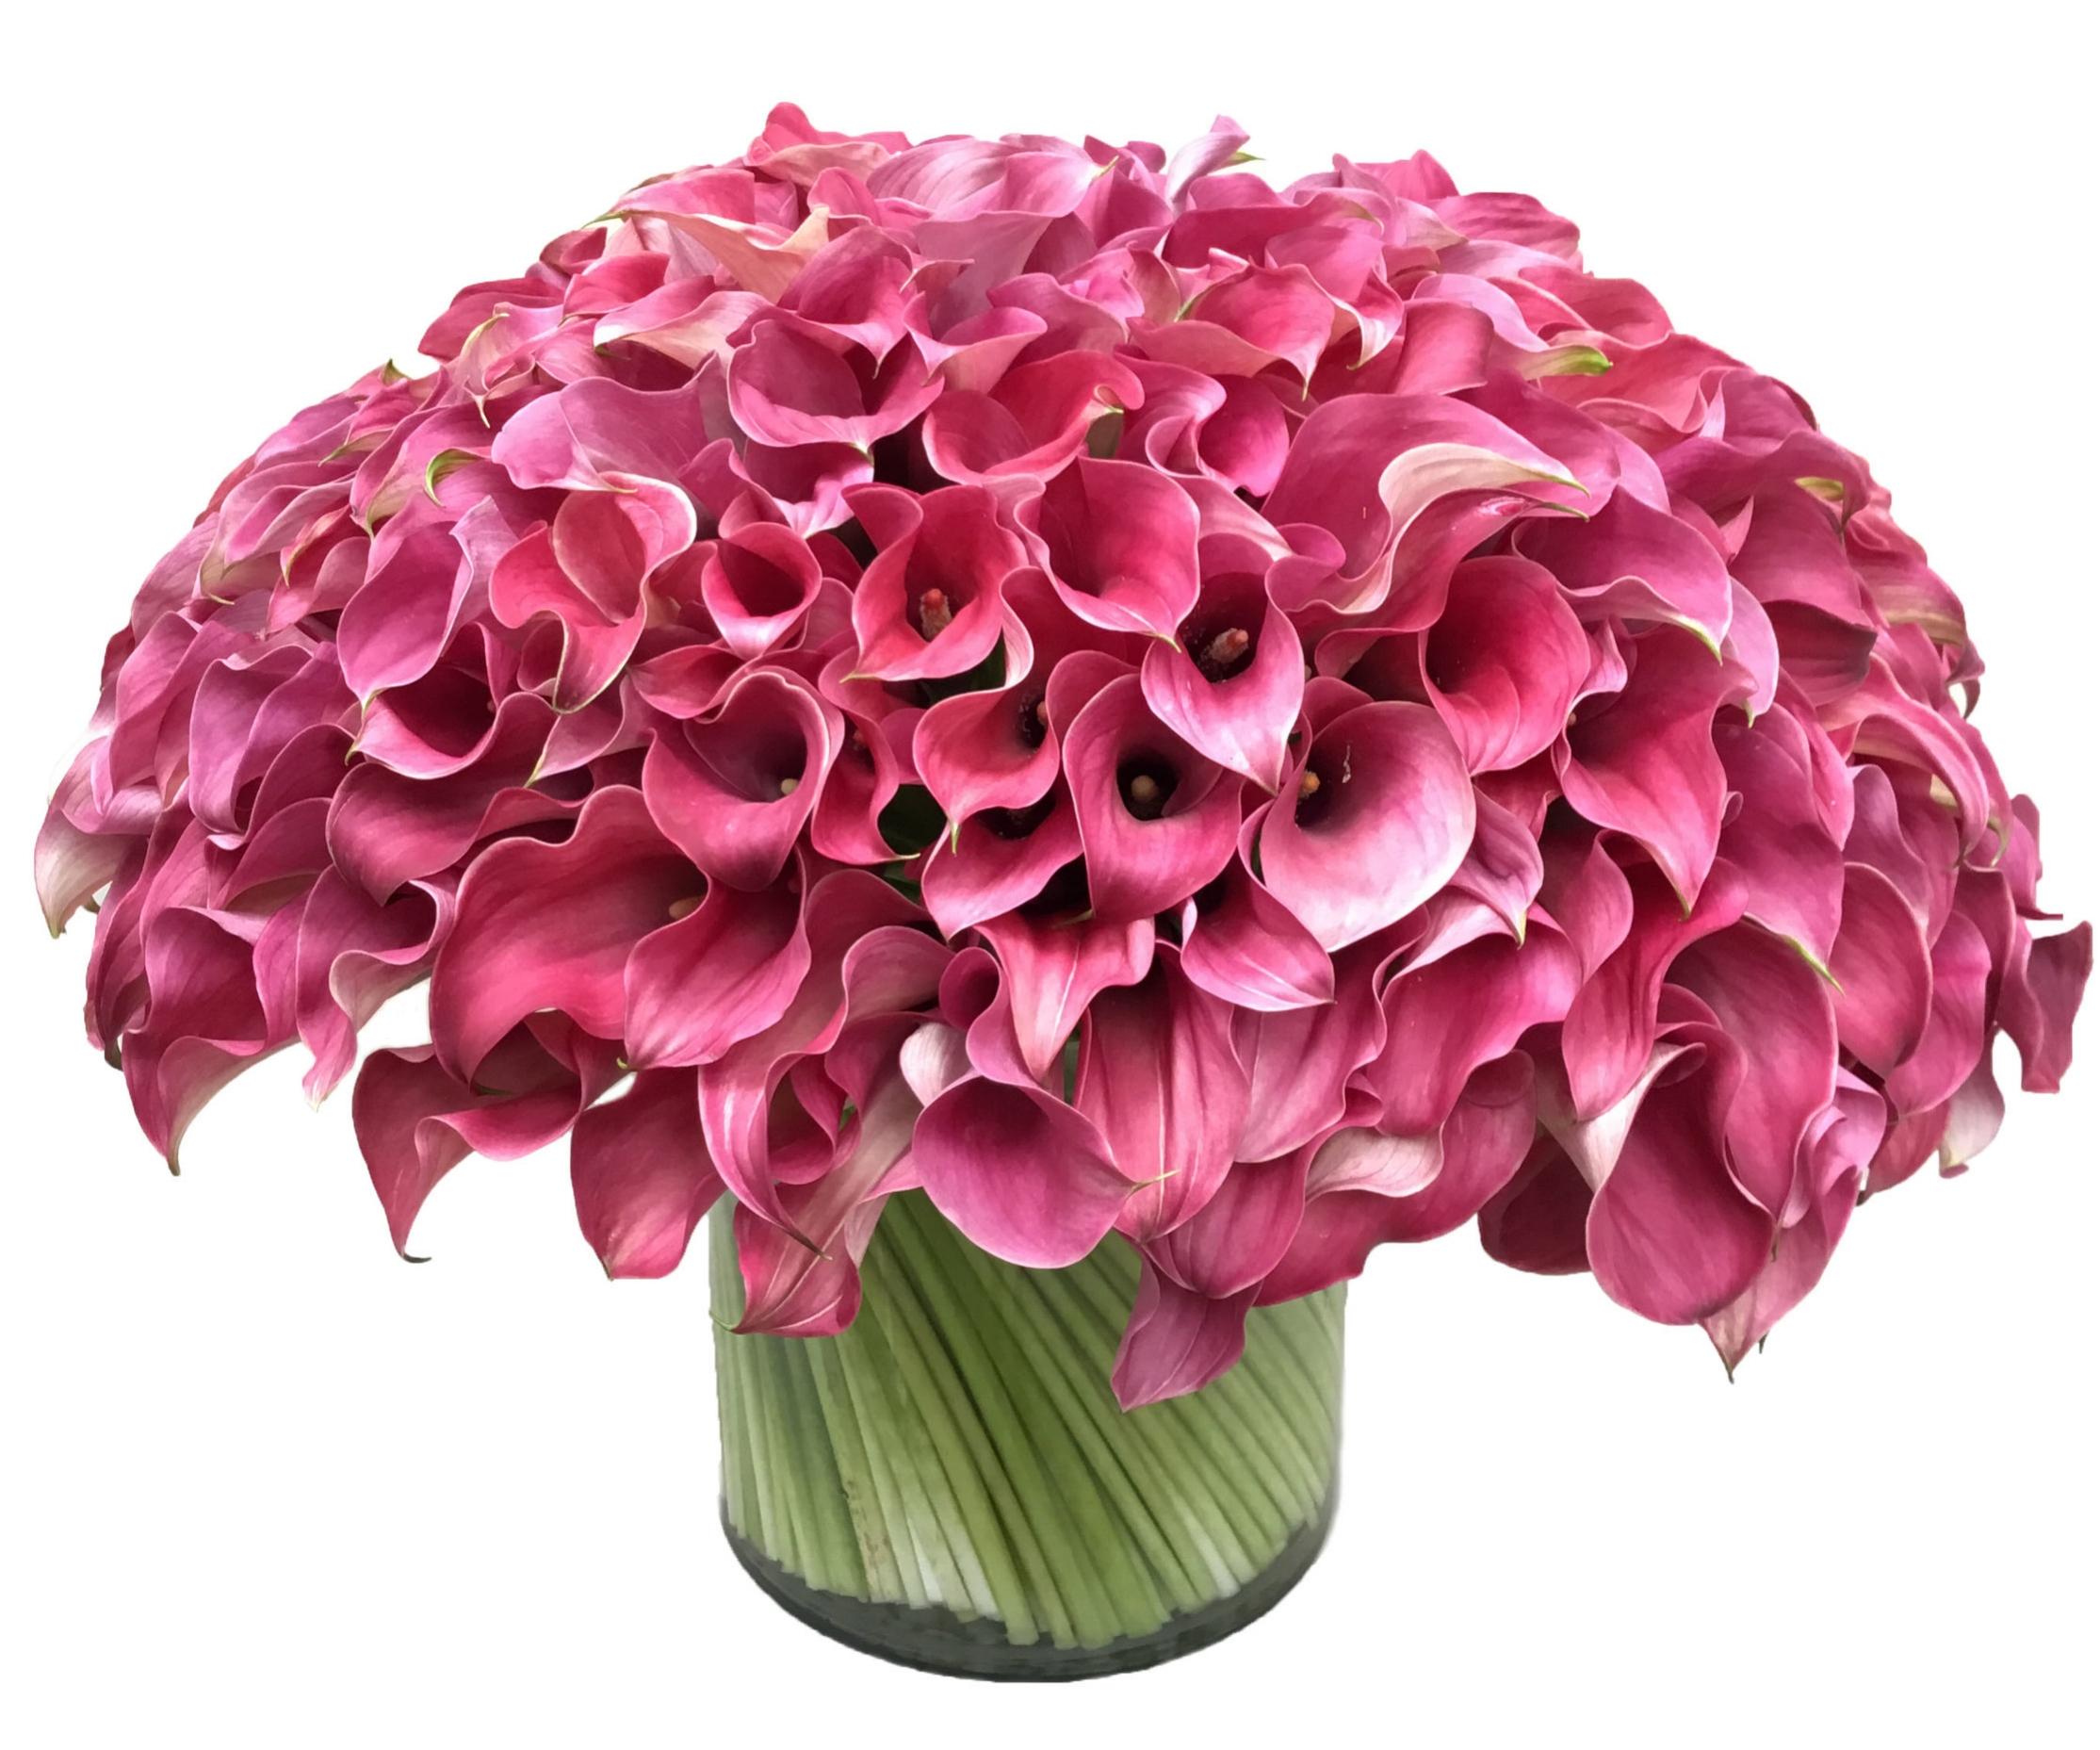 Rose Pink Calla Lilies start at $300